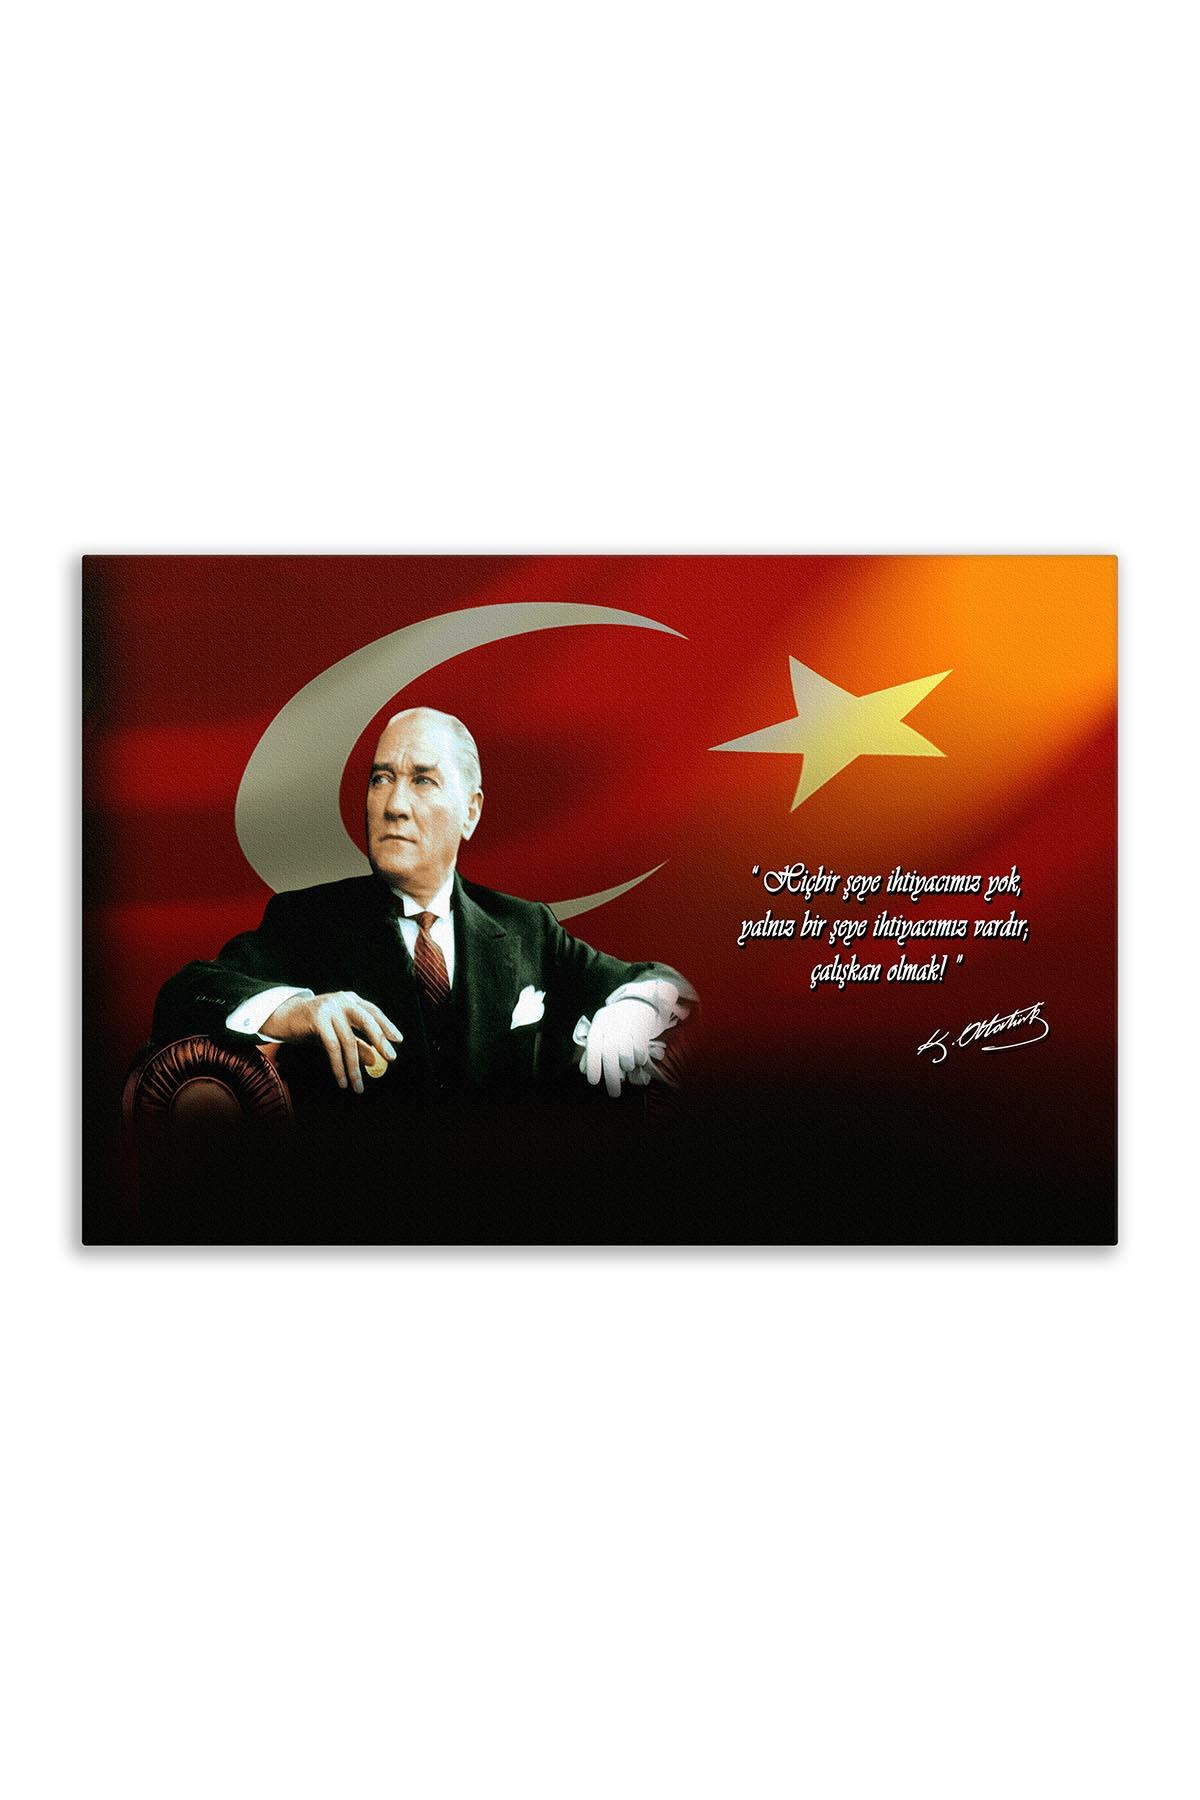 Atatürk Canvas Board With Turkish Flag | Printed Canvas Board | Digital Printed Board